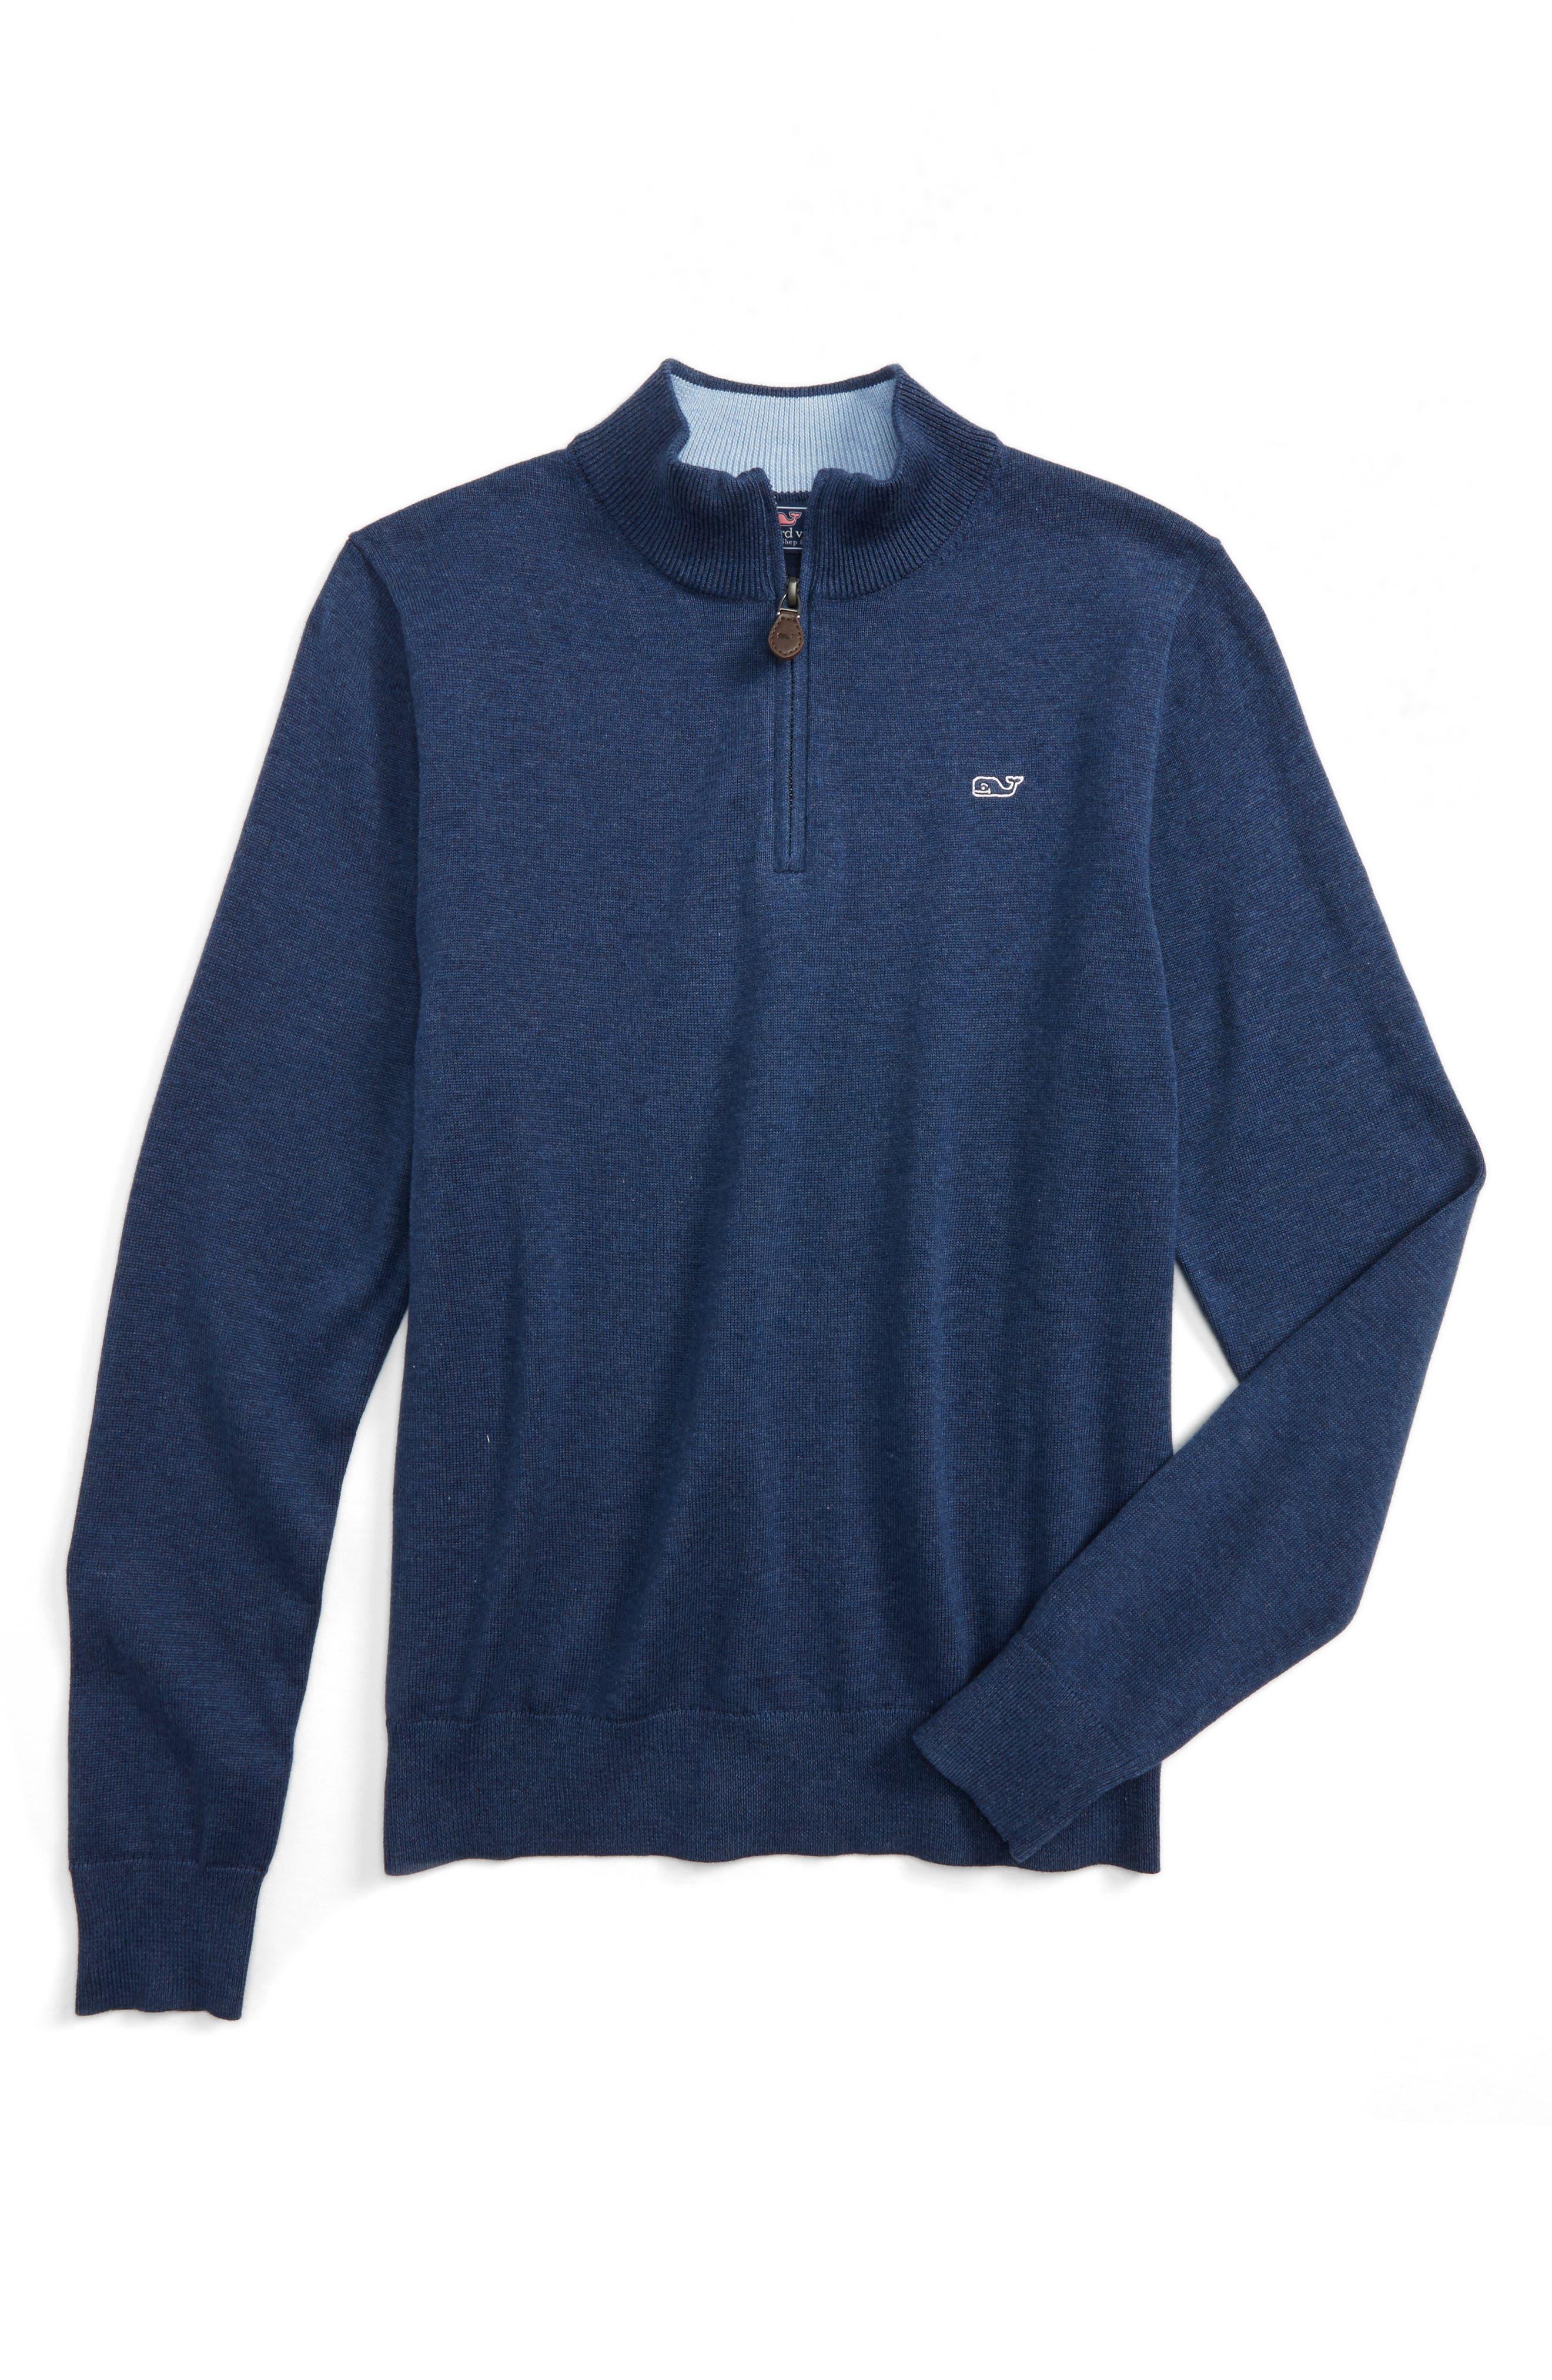 Main Image - vineyard vines Classic Quarter Zip Sweater (Big Boys)